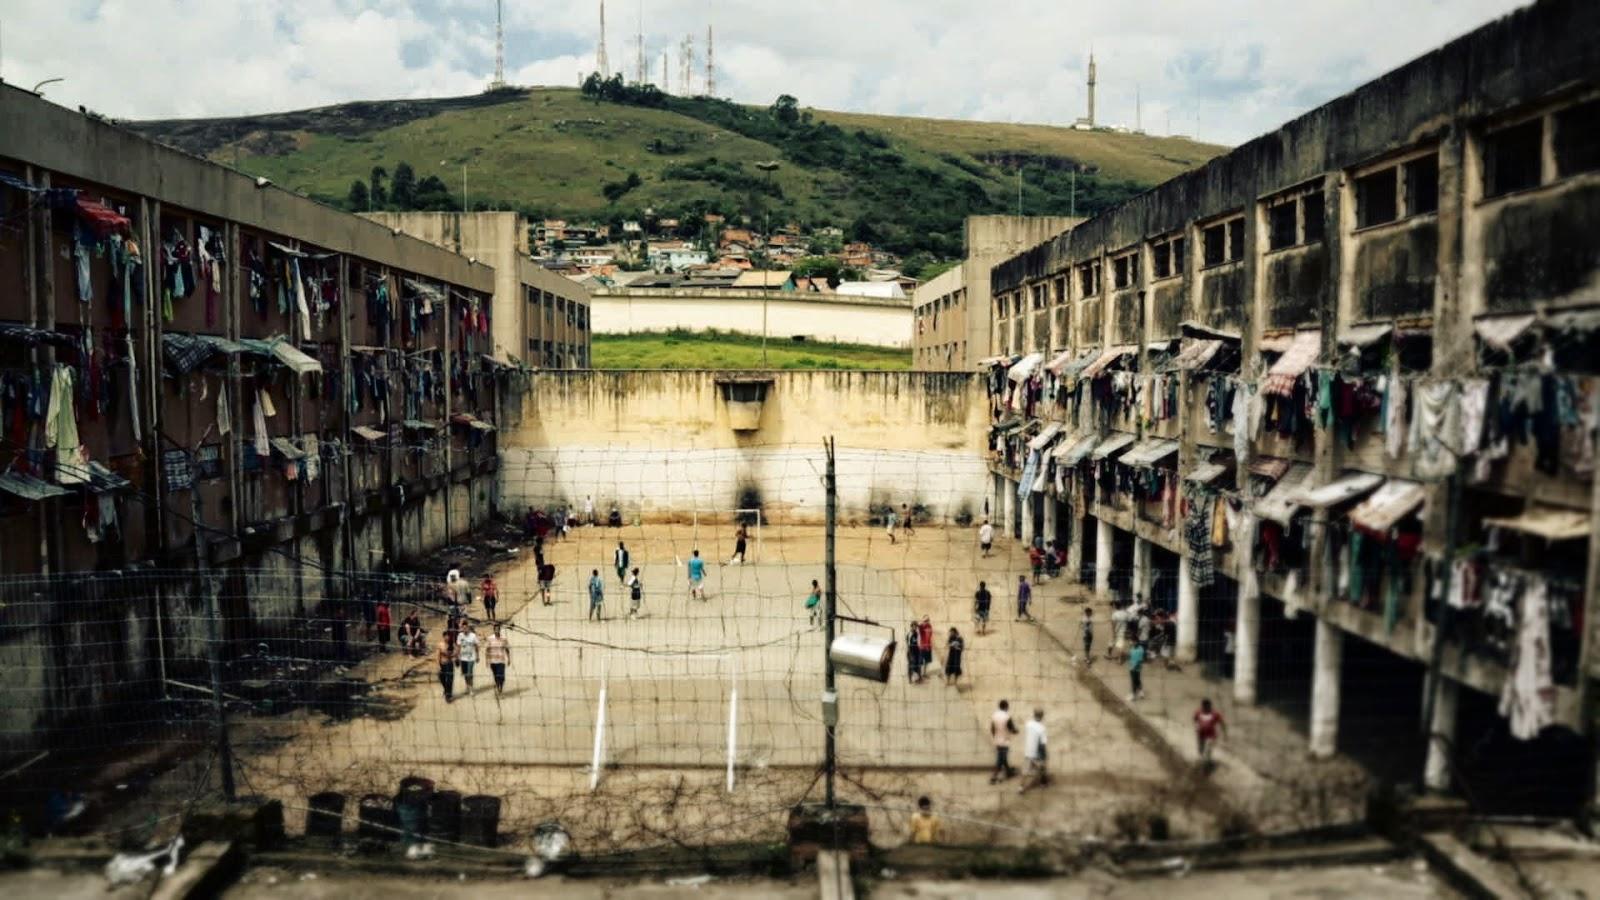 penitenciaria fuga rebeliao